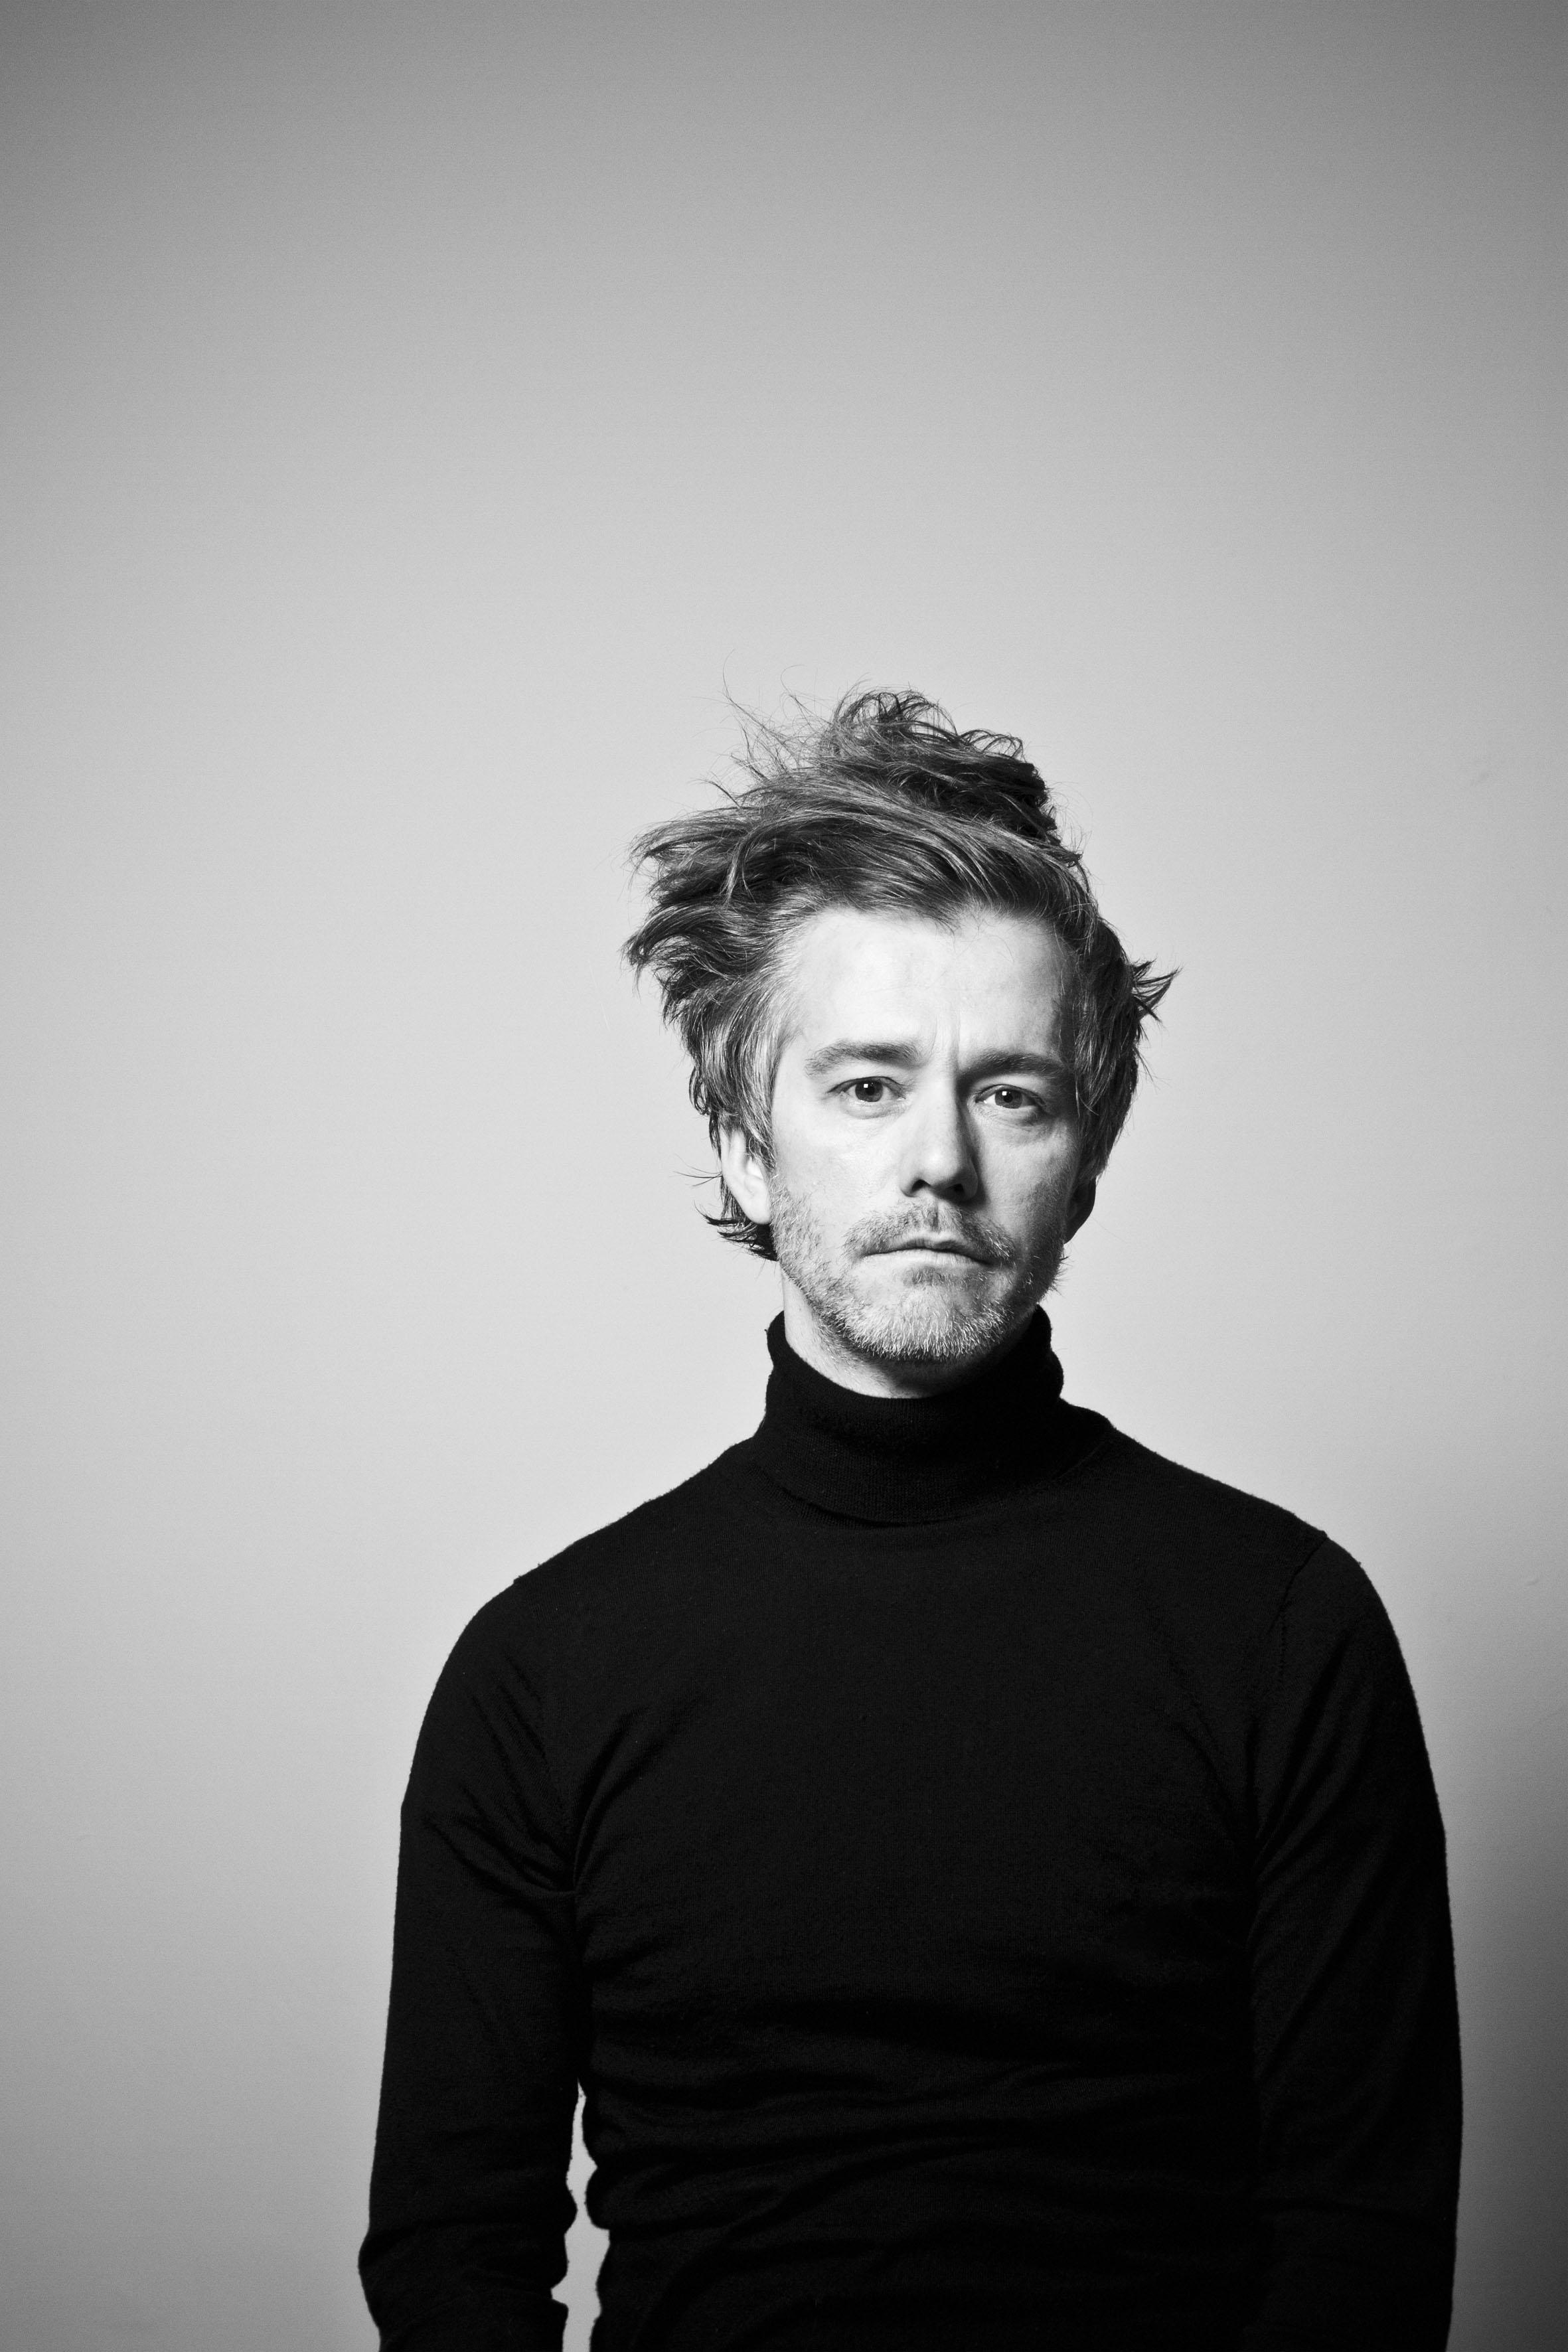 Photo: Kristian Davidek